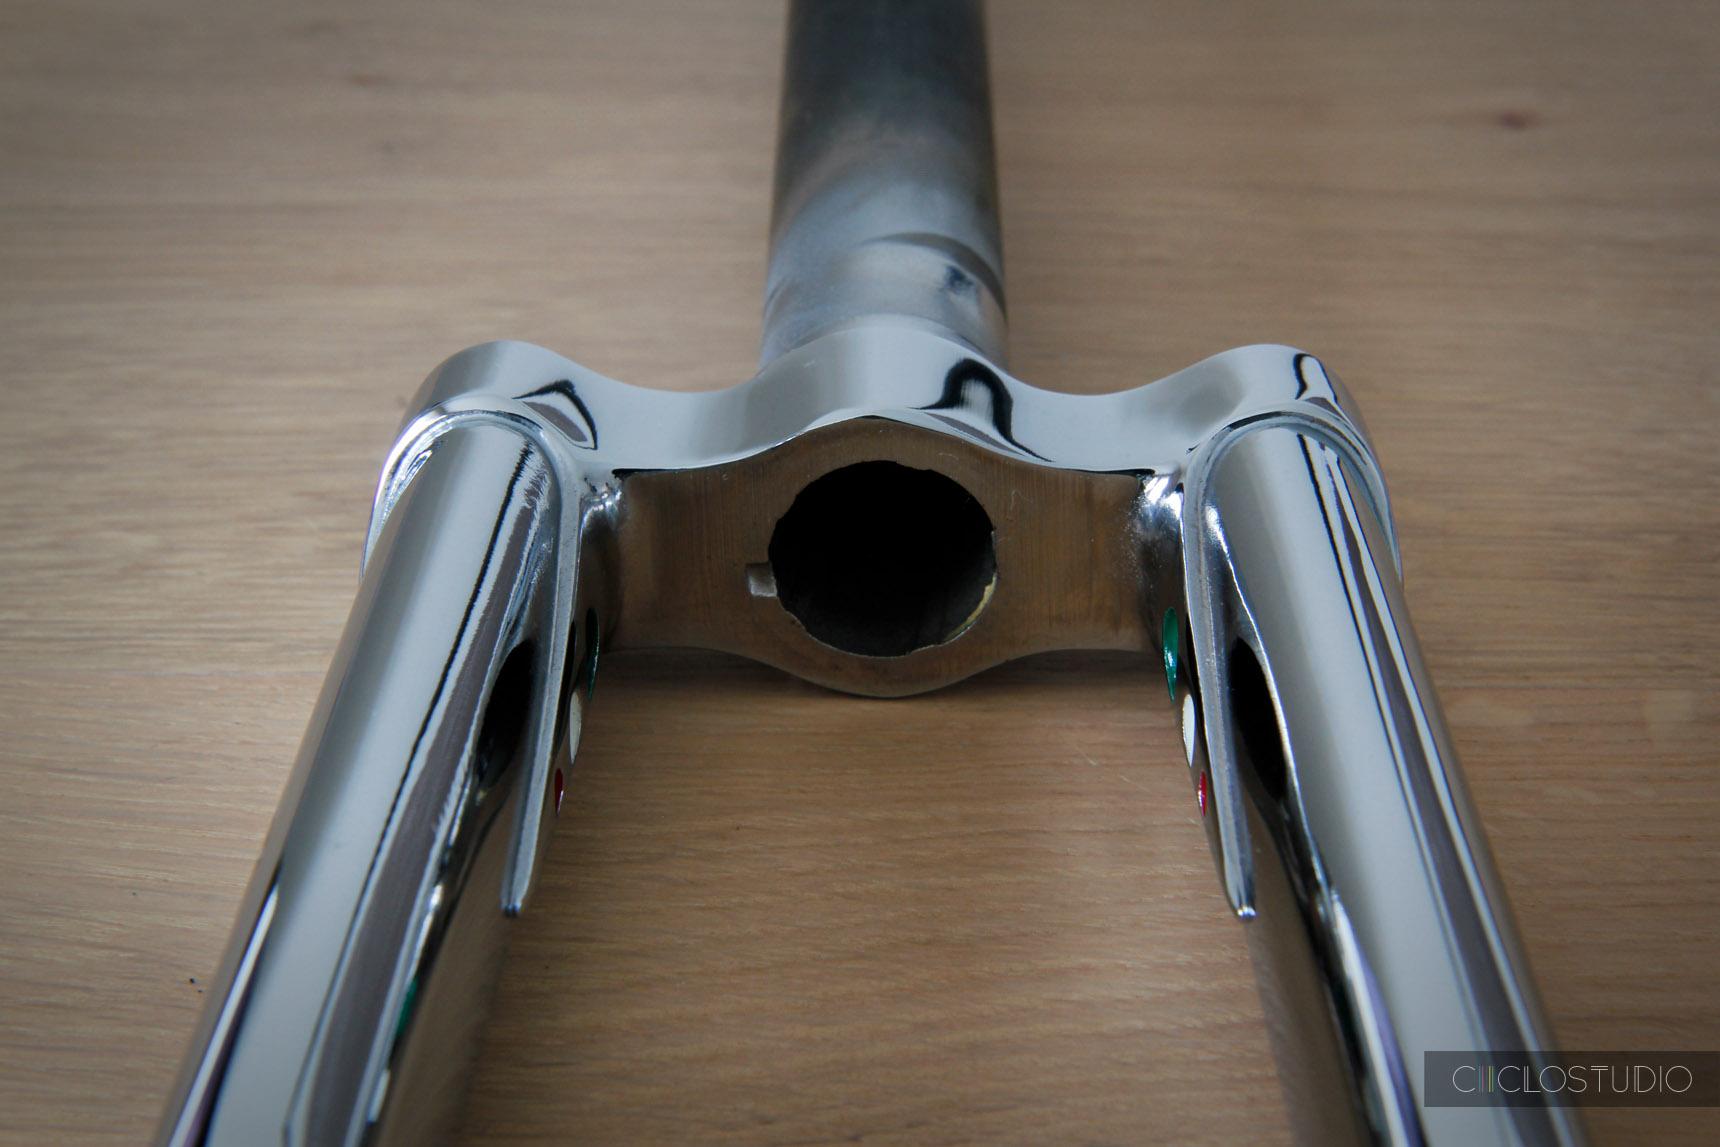 Gios Torino pista fork